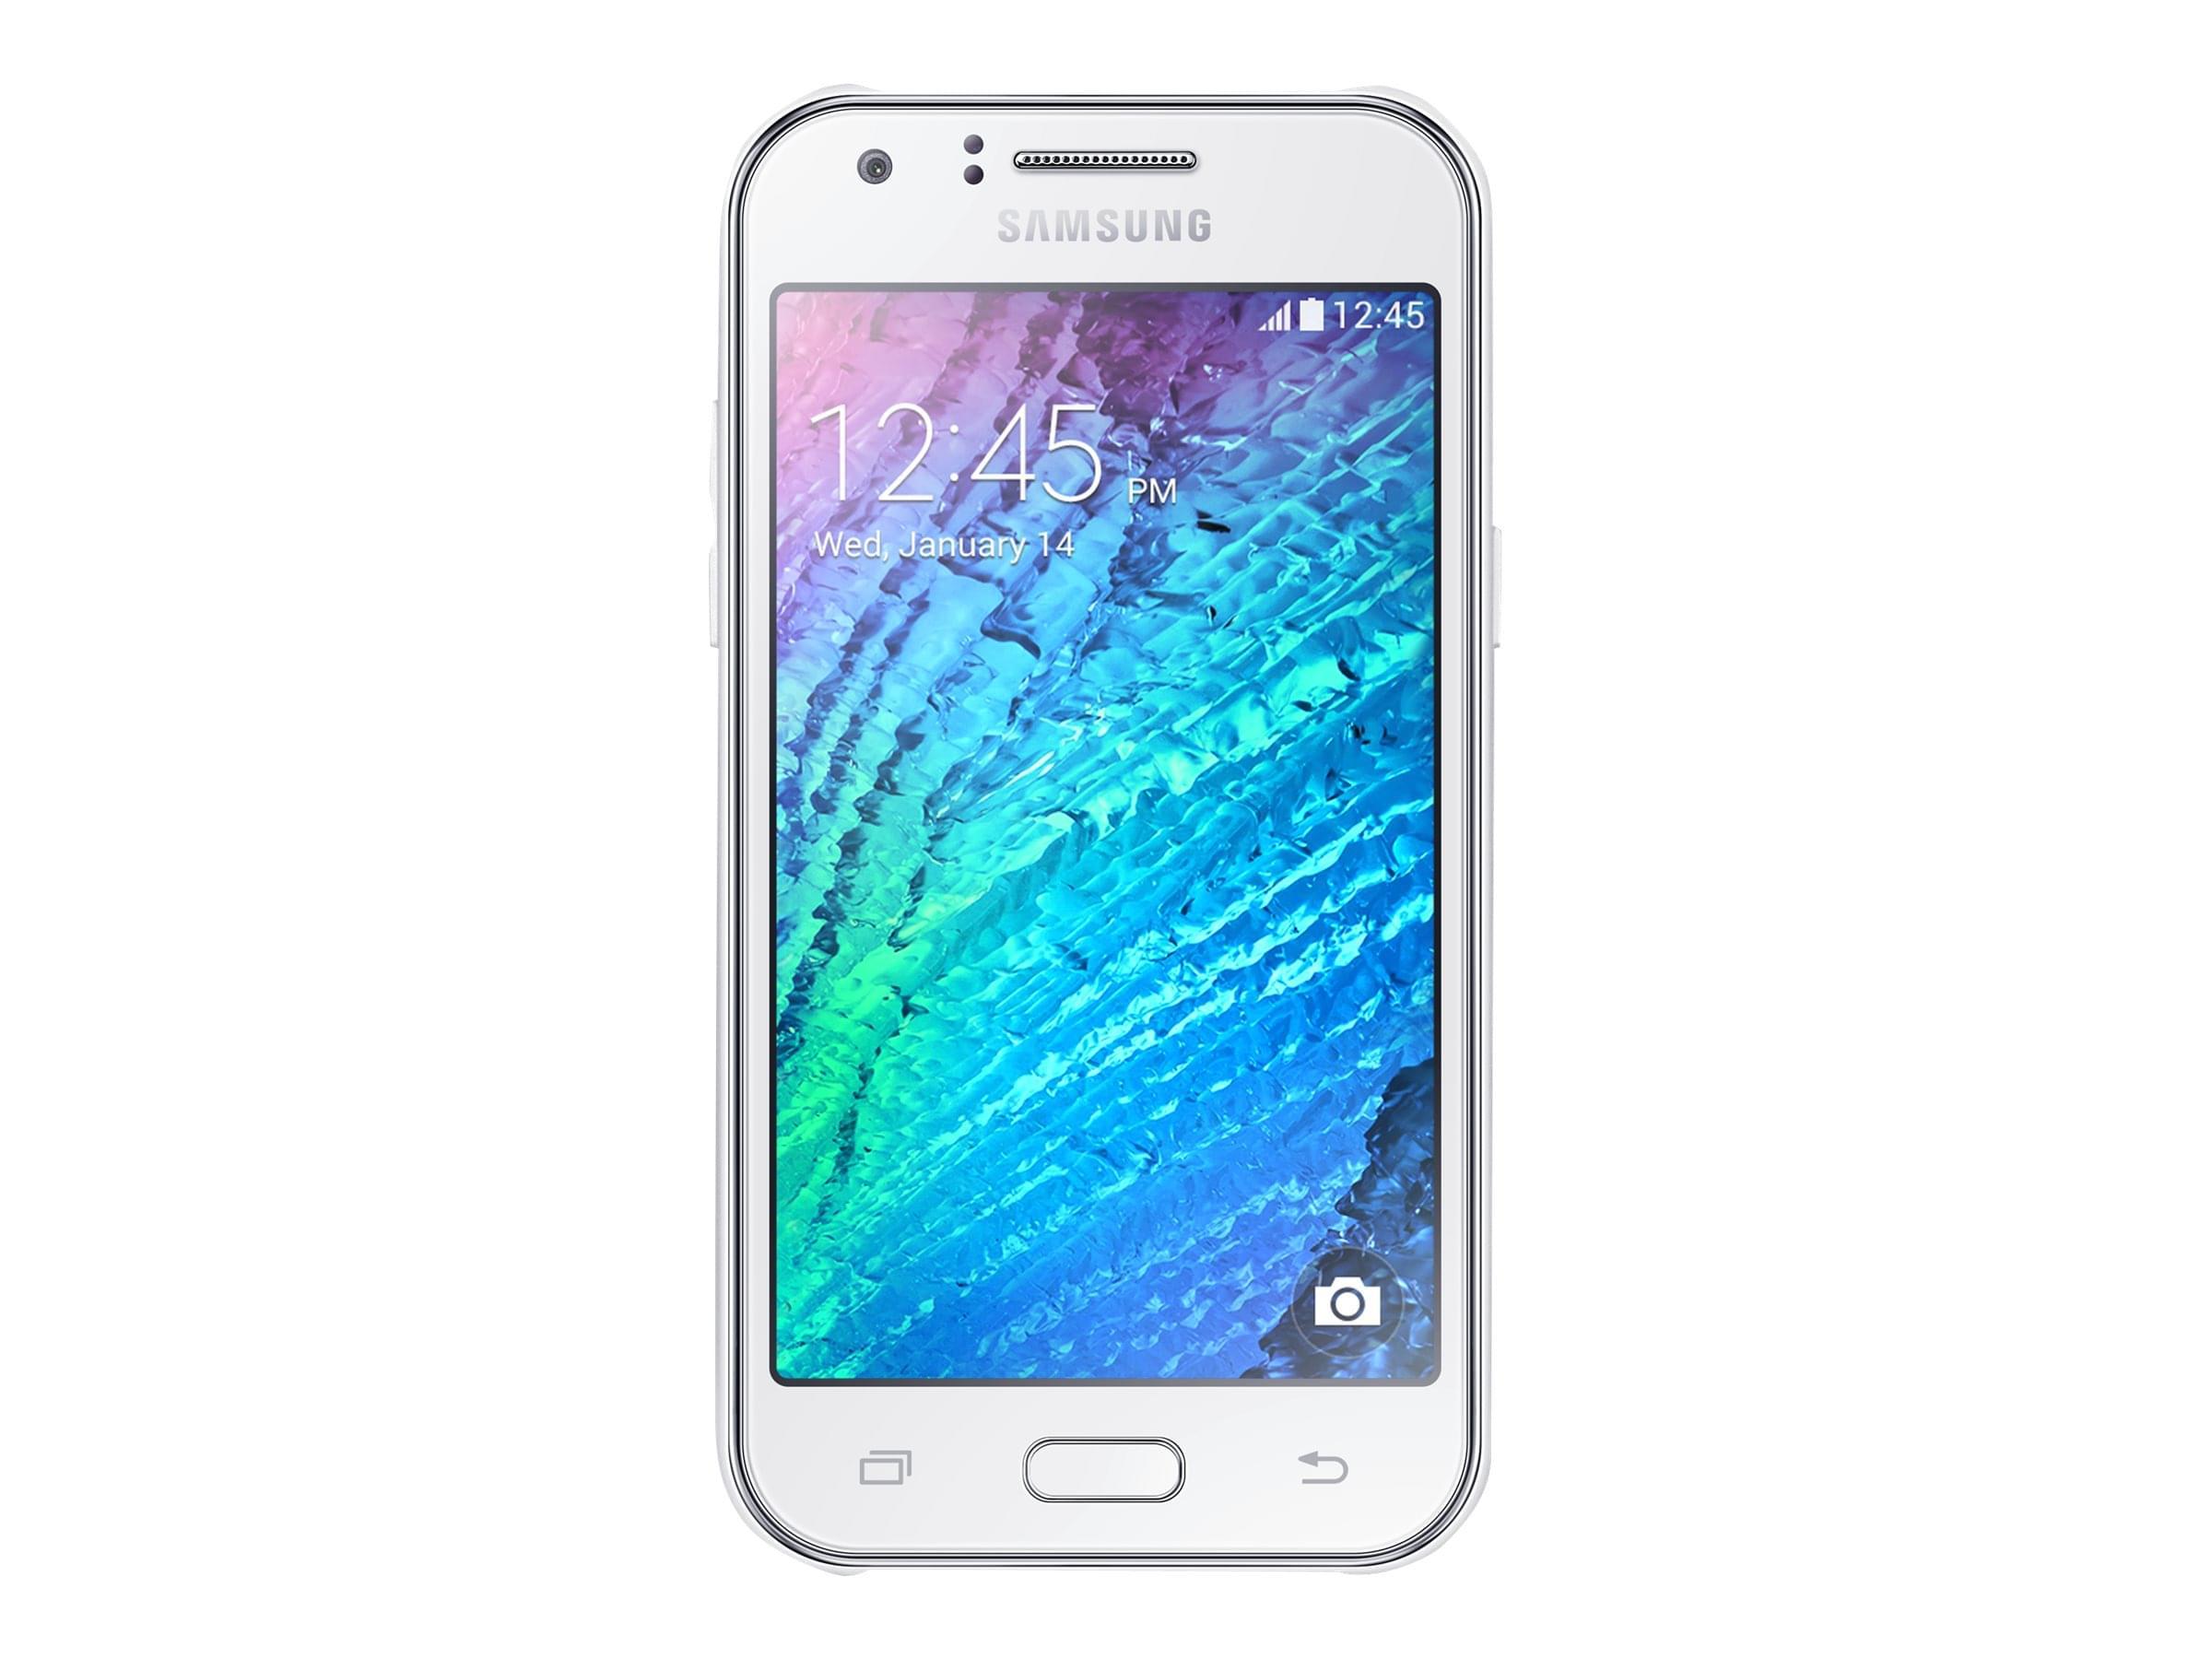 Samsung Galaxy J1 4Go SM-J100H Dual SIM White (SM-J100H) - Achat / Vente Téléphonie sur Cybertek.fr - 0